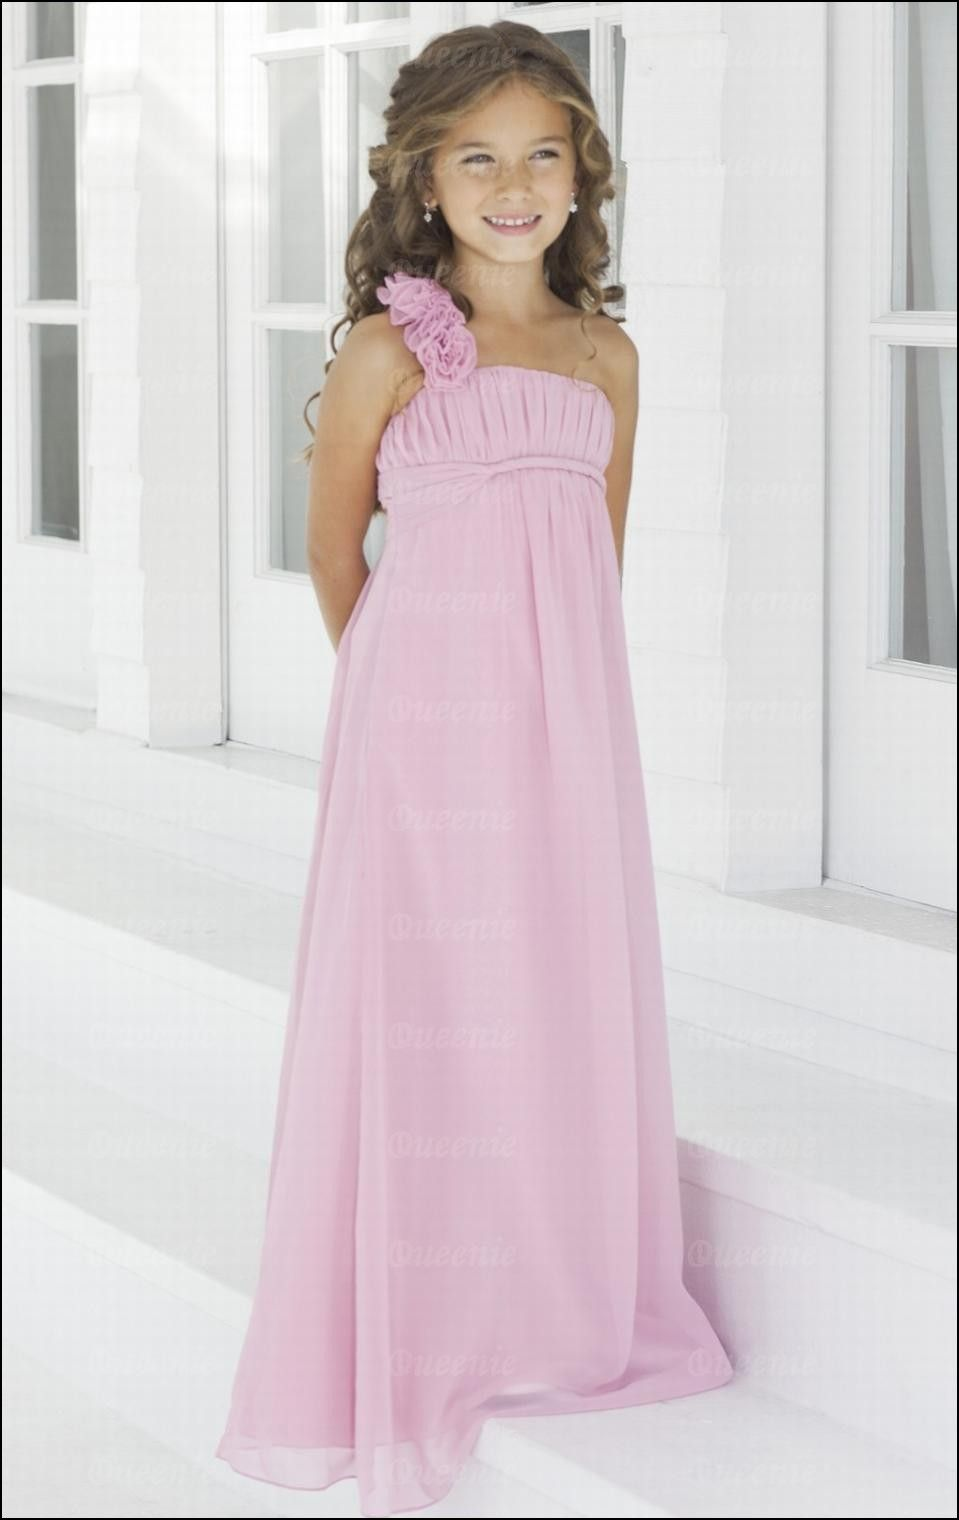 Purple childrens bridesmaid dresses dresses and gowns ideas purple childrens bridesmaid dresses ombrellifo Choice Image